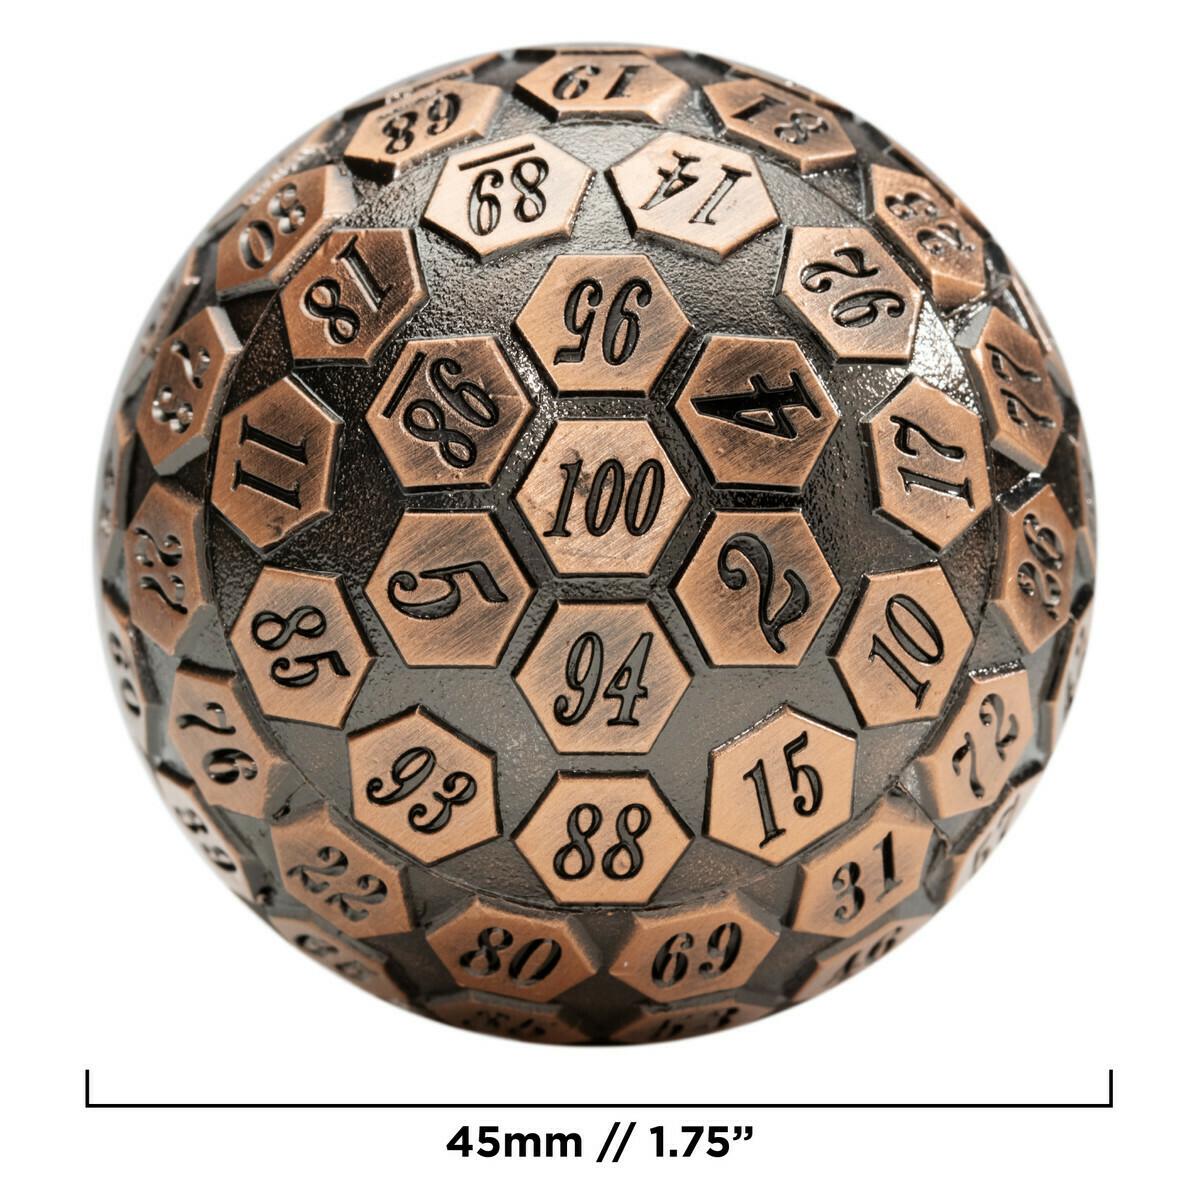 45MM Metal D100 Die - Orb of Predestined Fate - Ancient Copper RPG Tabletop